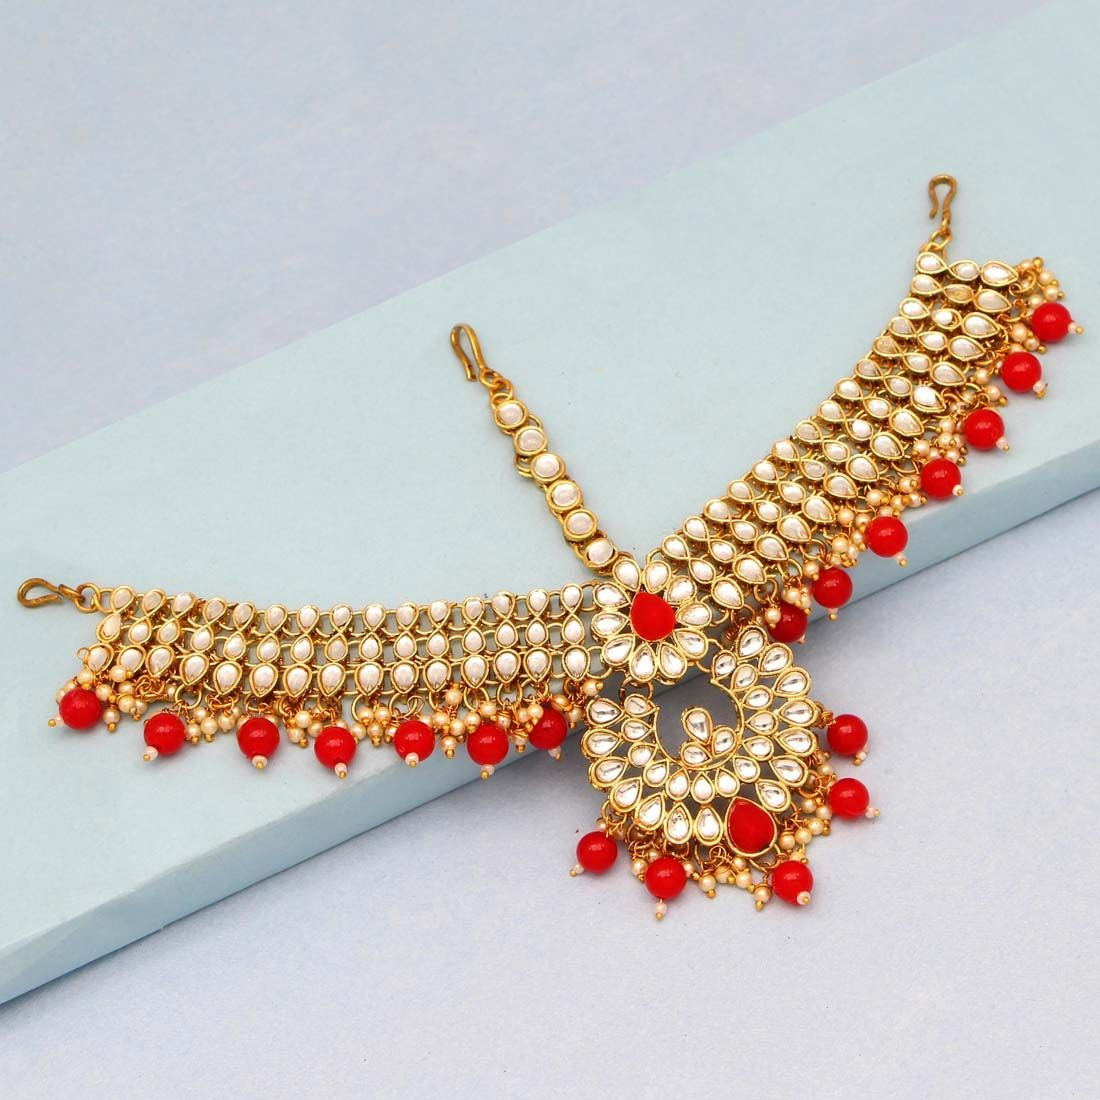 Tiara hindu colgantes rojos